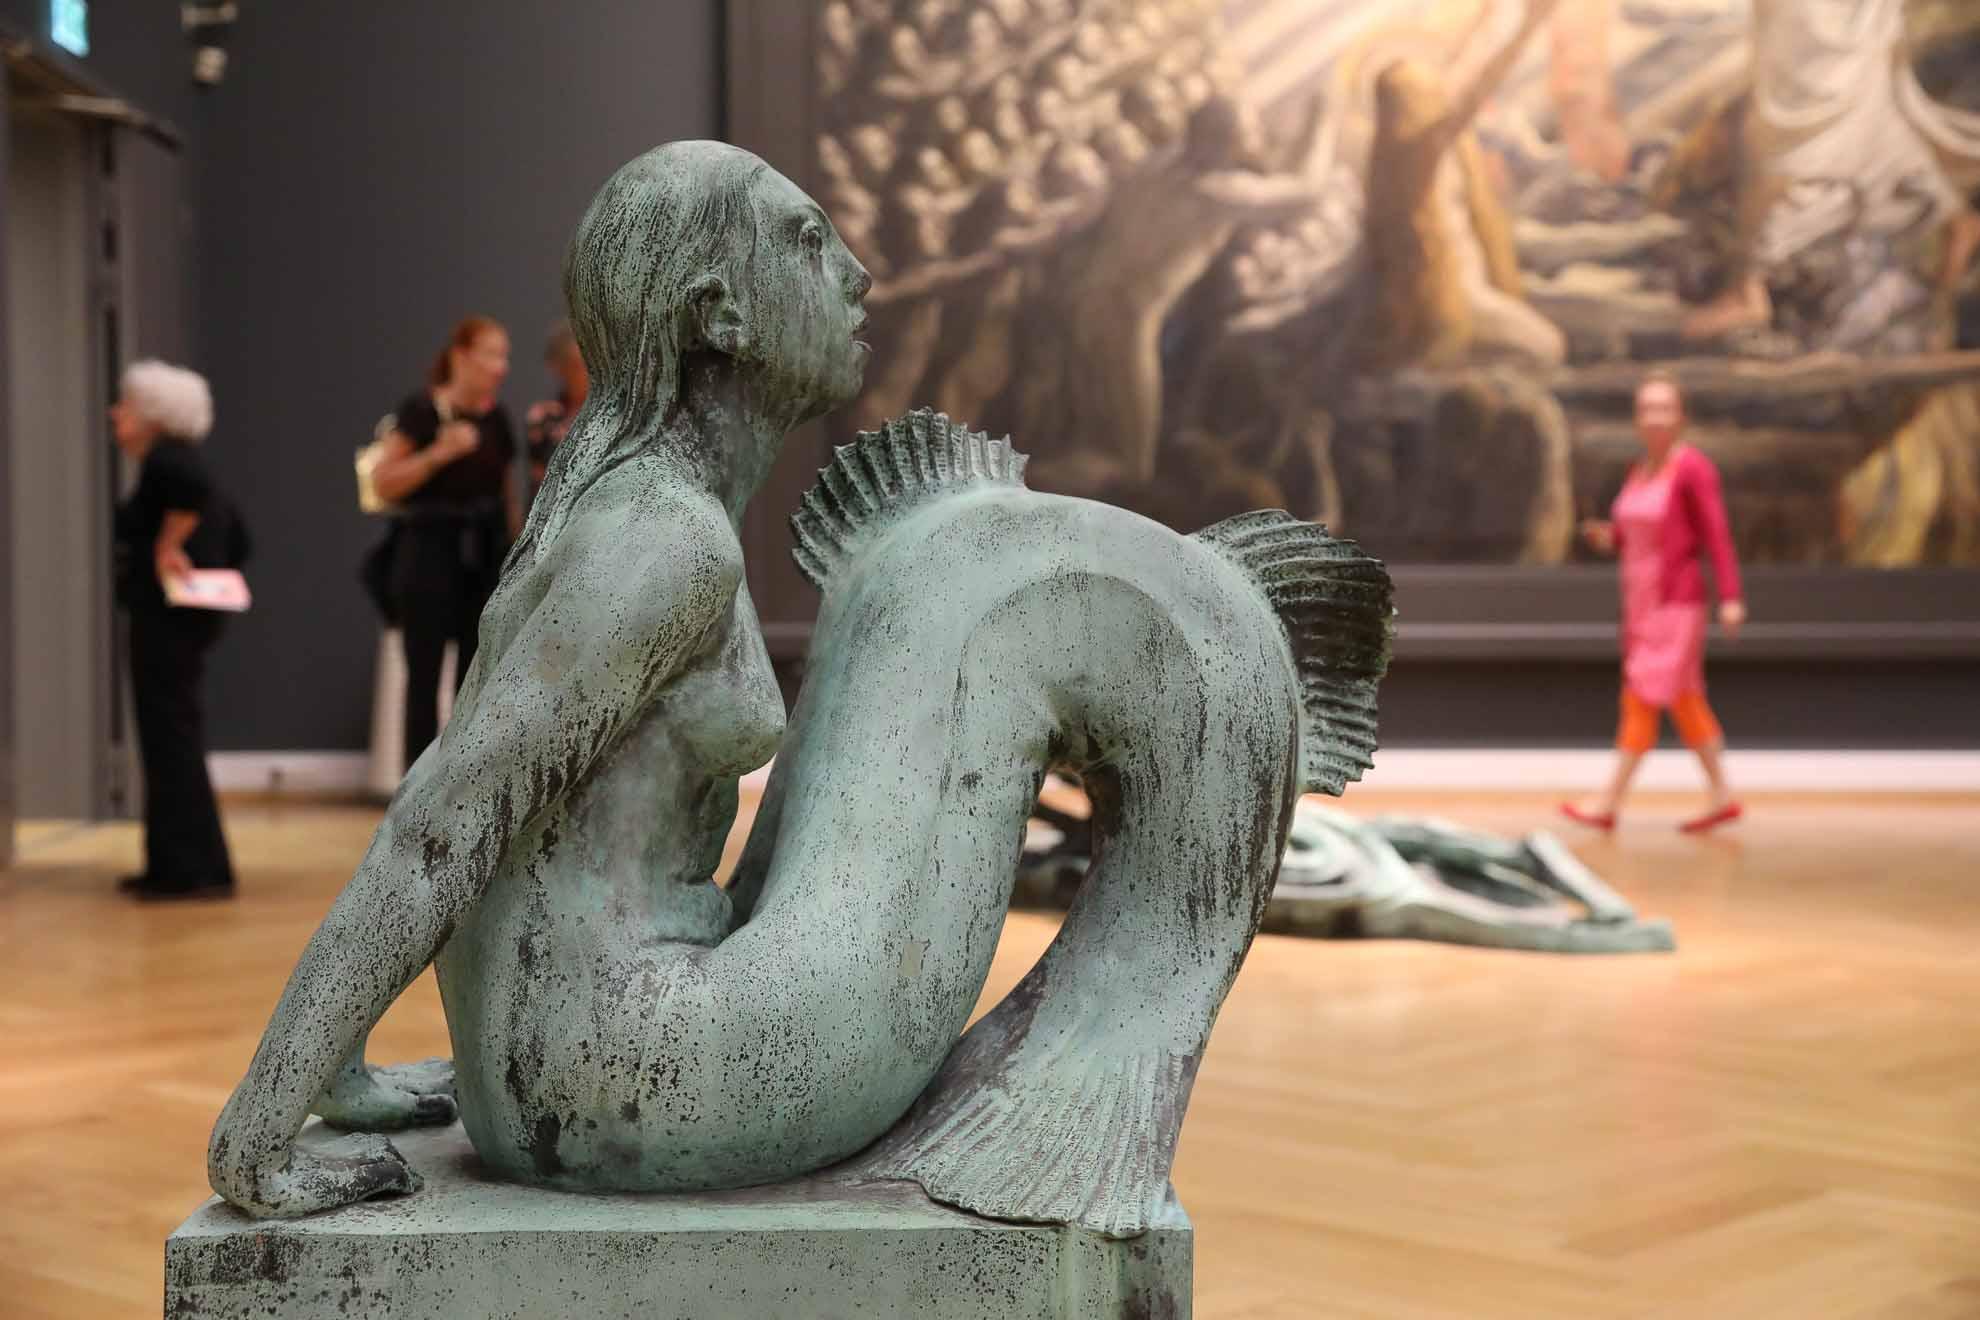 ... und sehen unter anderem die Meerjungfrau von Anne Marie Carl-Nielsen